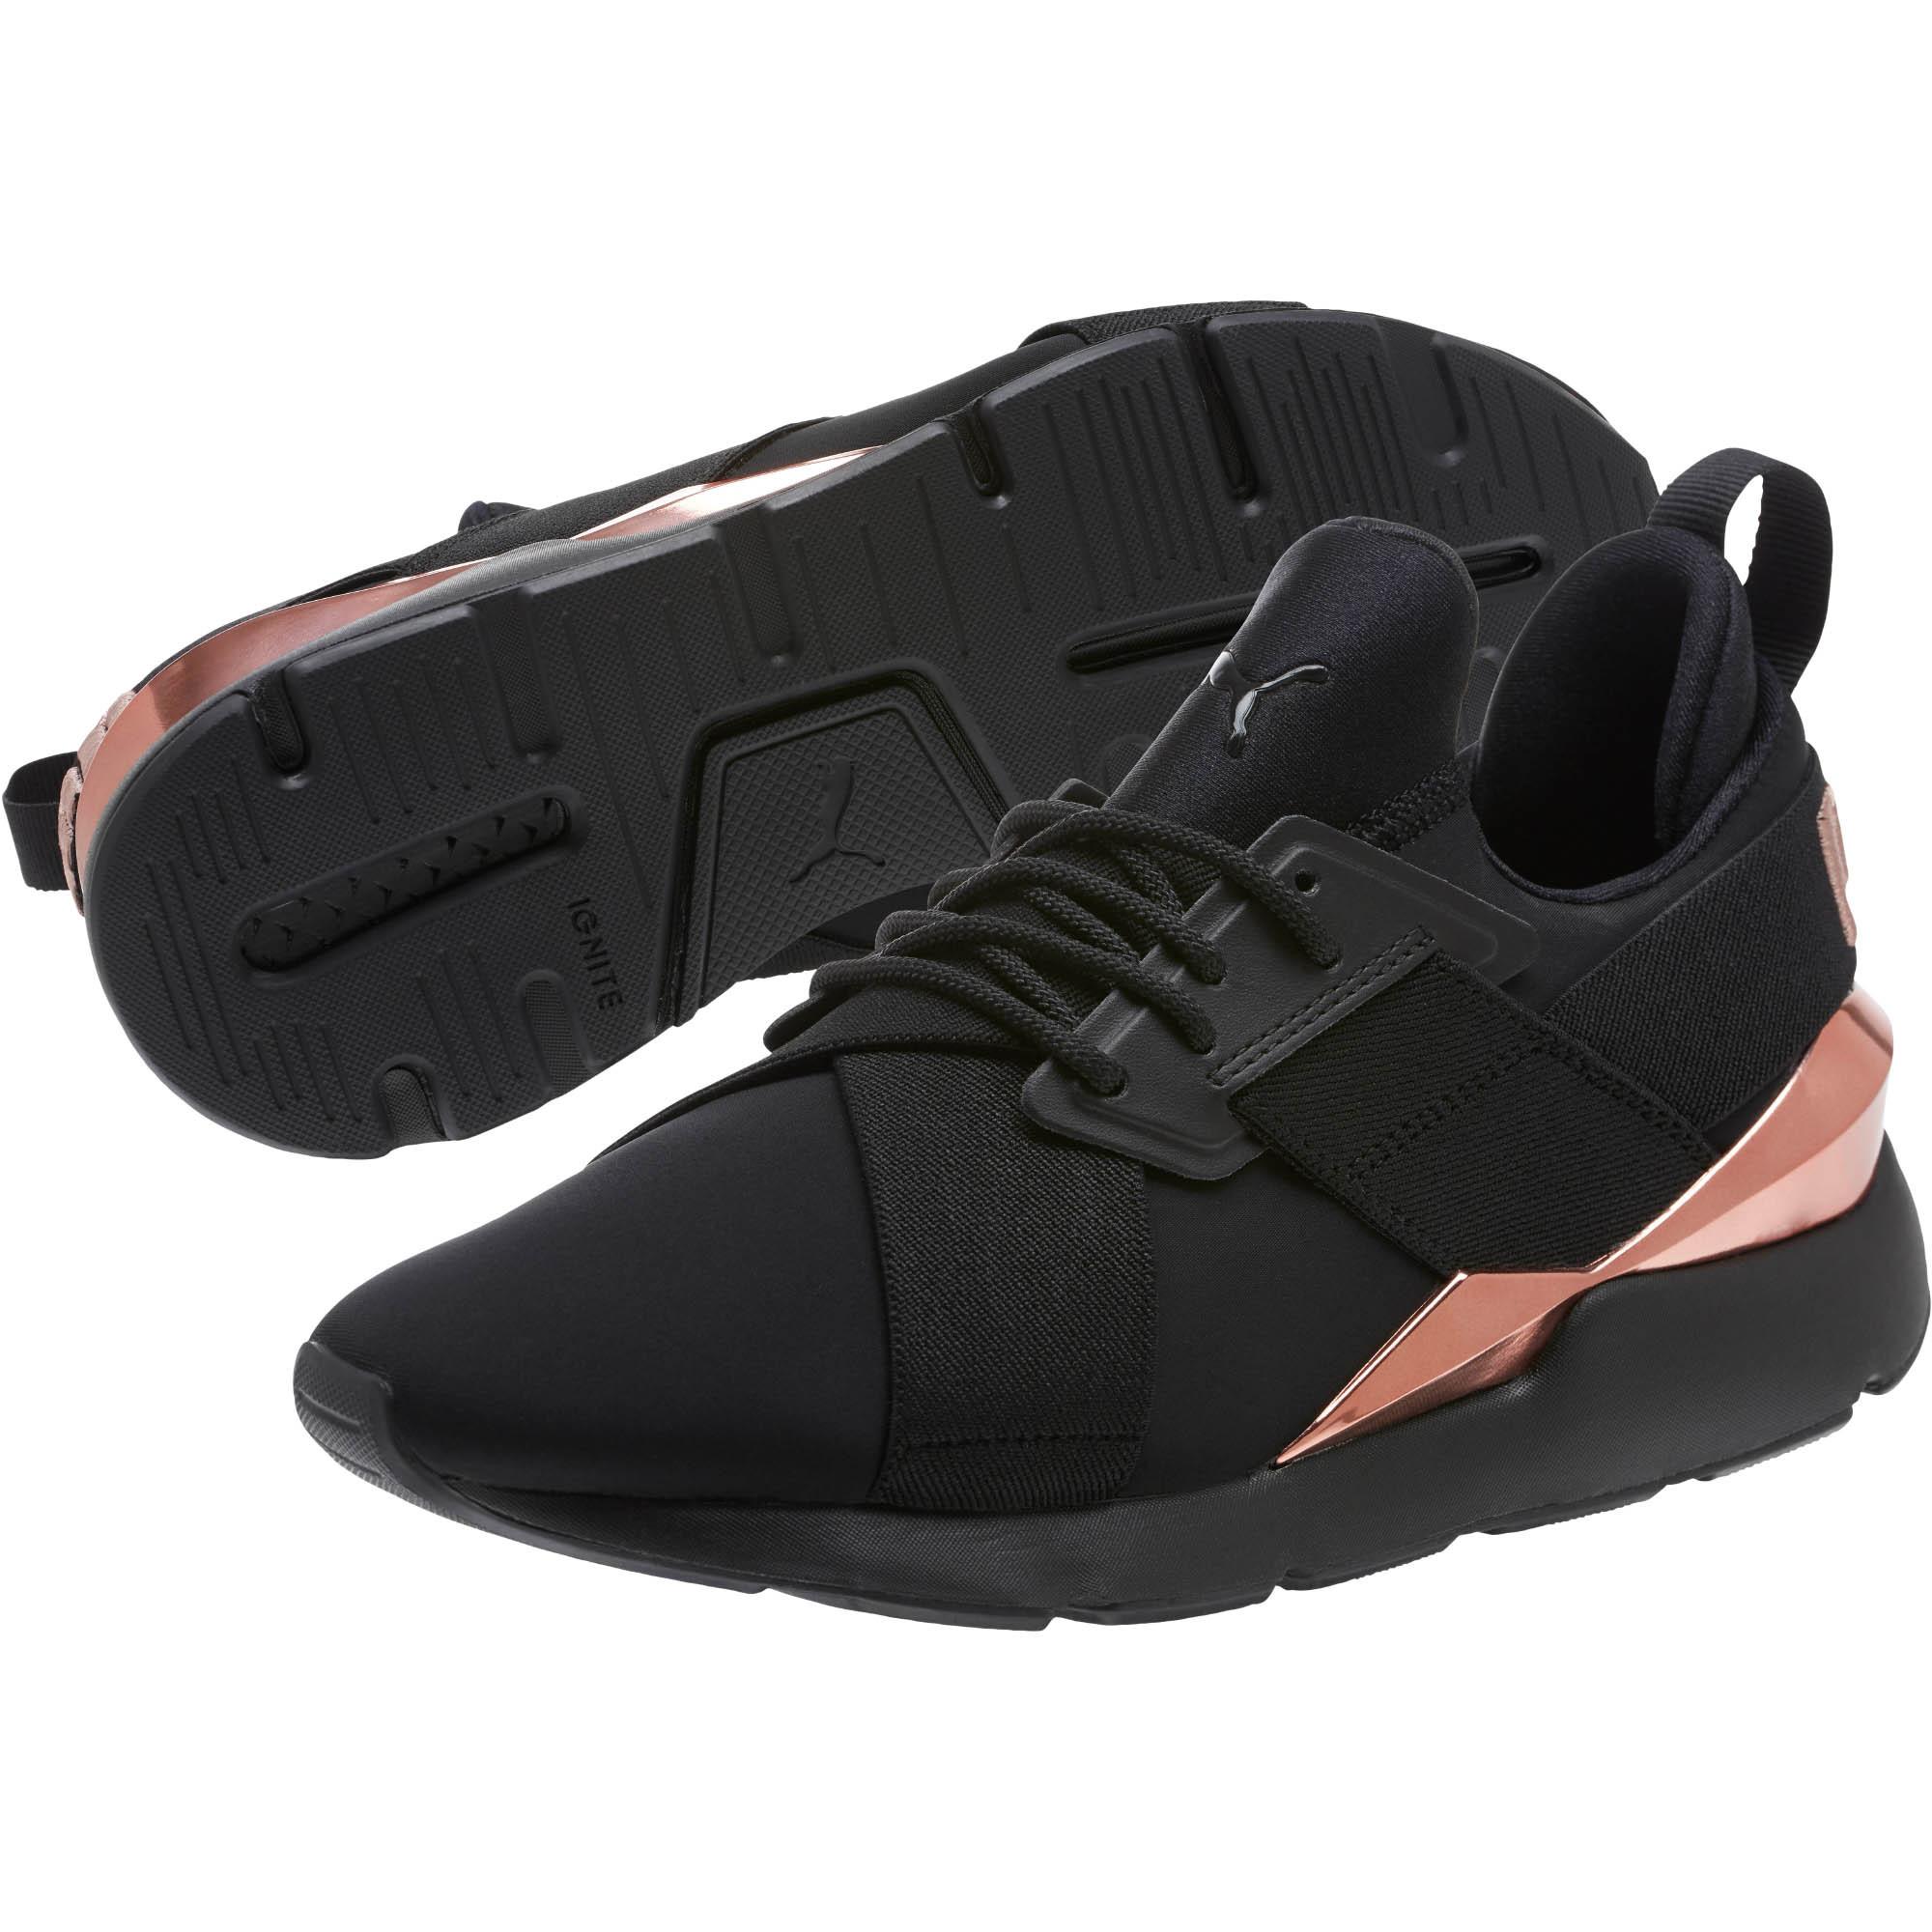 50120a3f6d80 Official Puma Store  PUMA Muse Metal Women s Sneakers Women Shoe ...